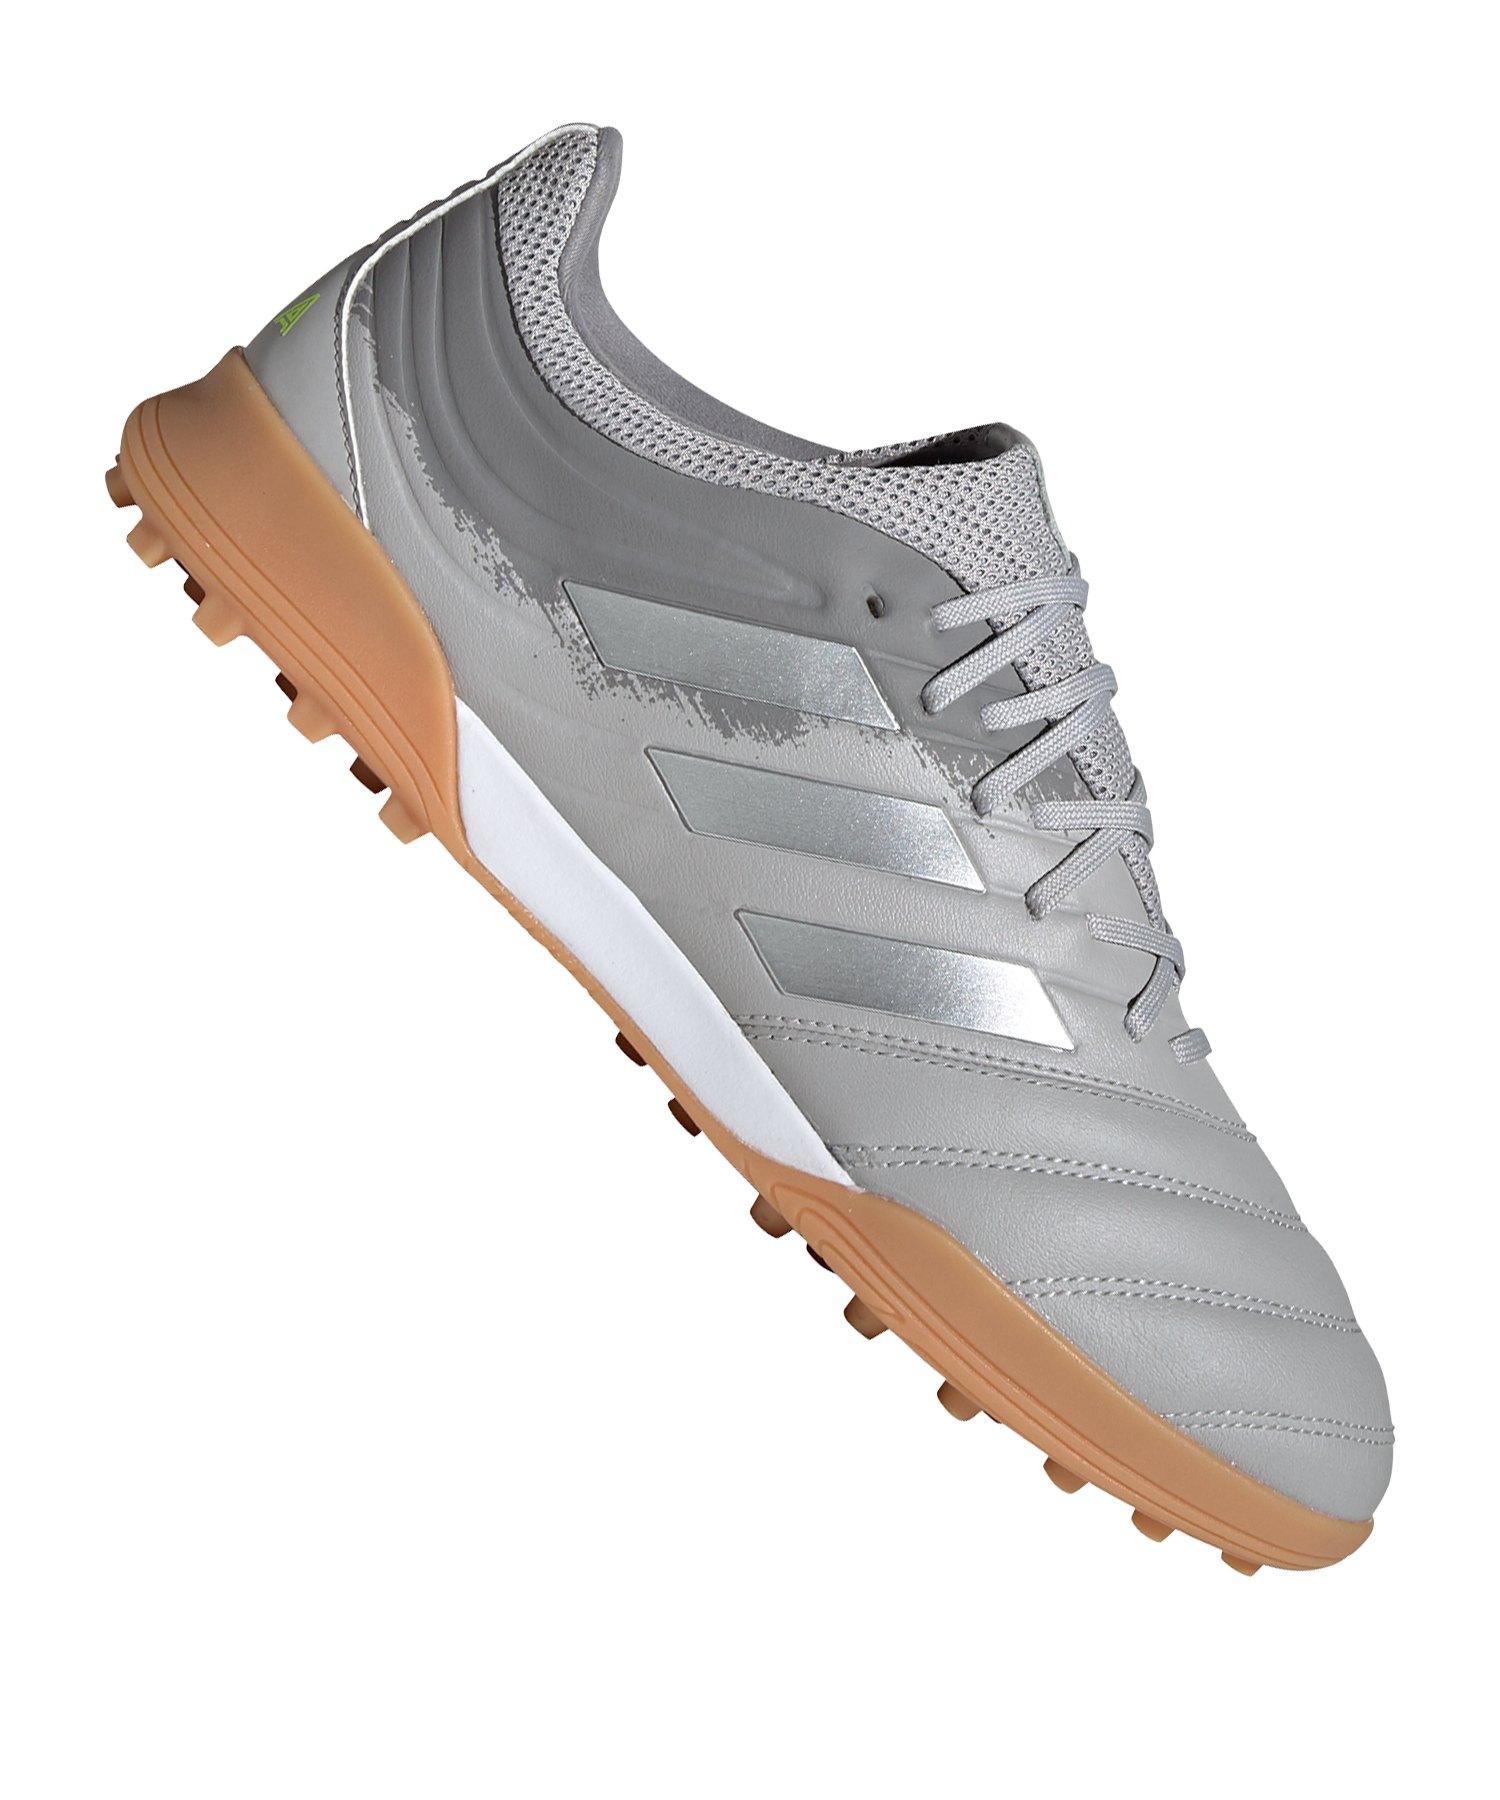 adidas COPA 20.3 TF Grau Silber - grau